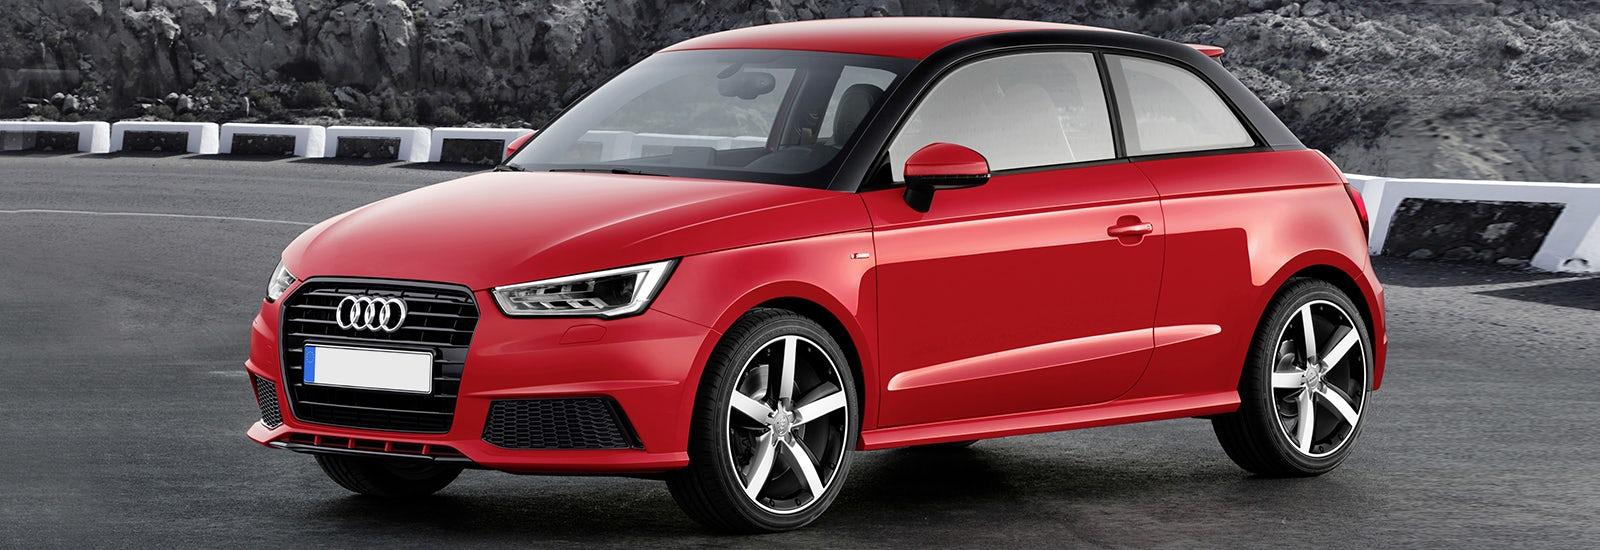 Cheap Audi Cars On Finance